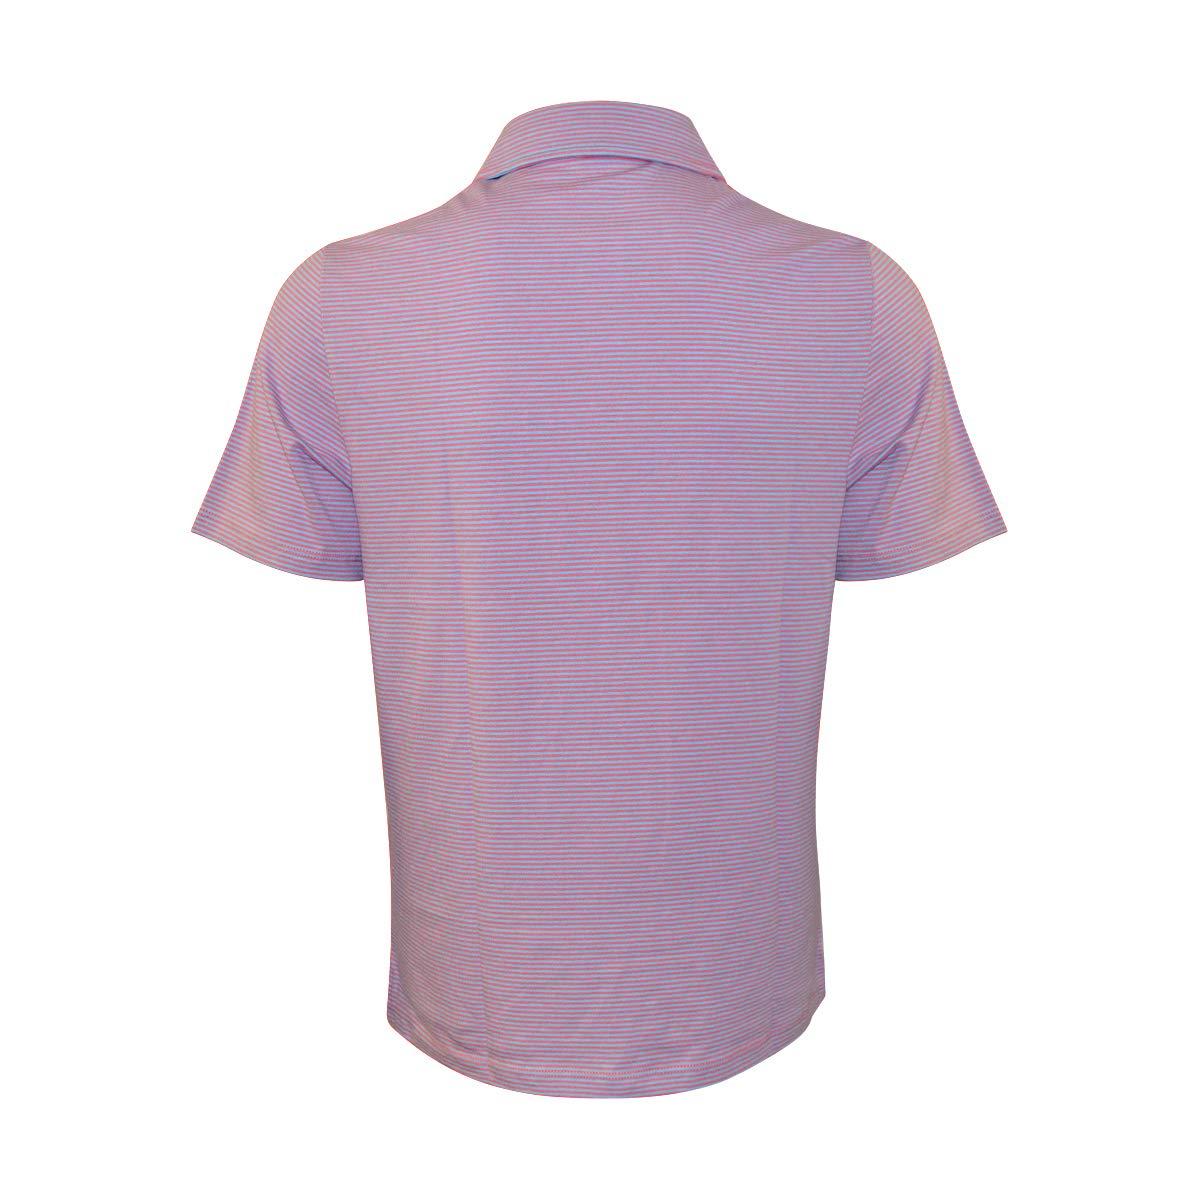 Vineyard Vines Mens Edgartown Short Sleeve Polo Shirt